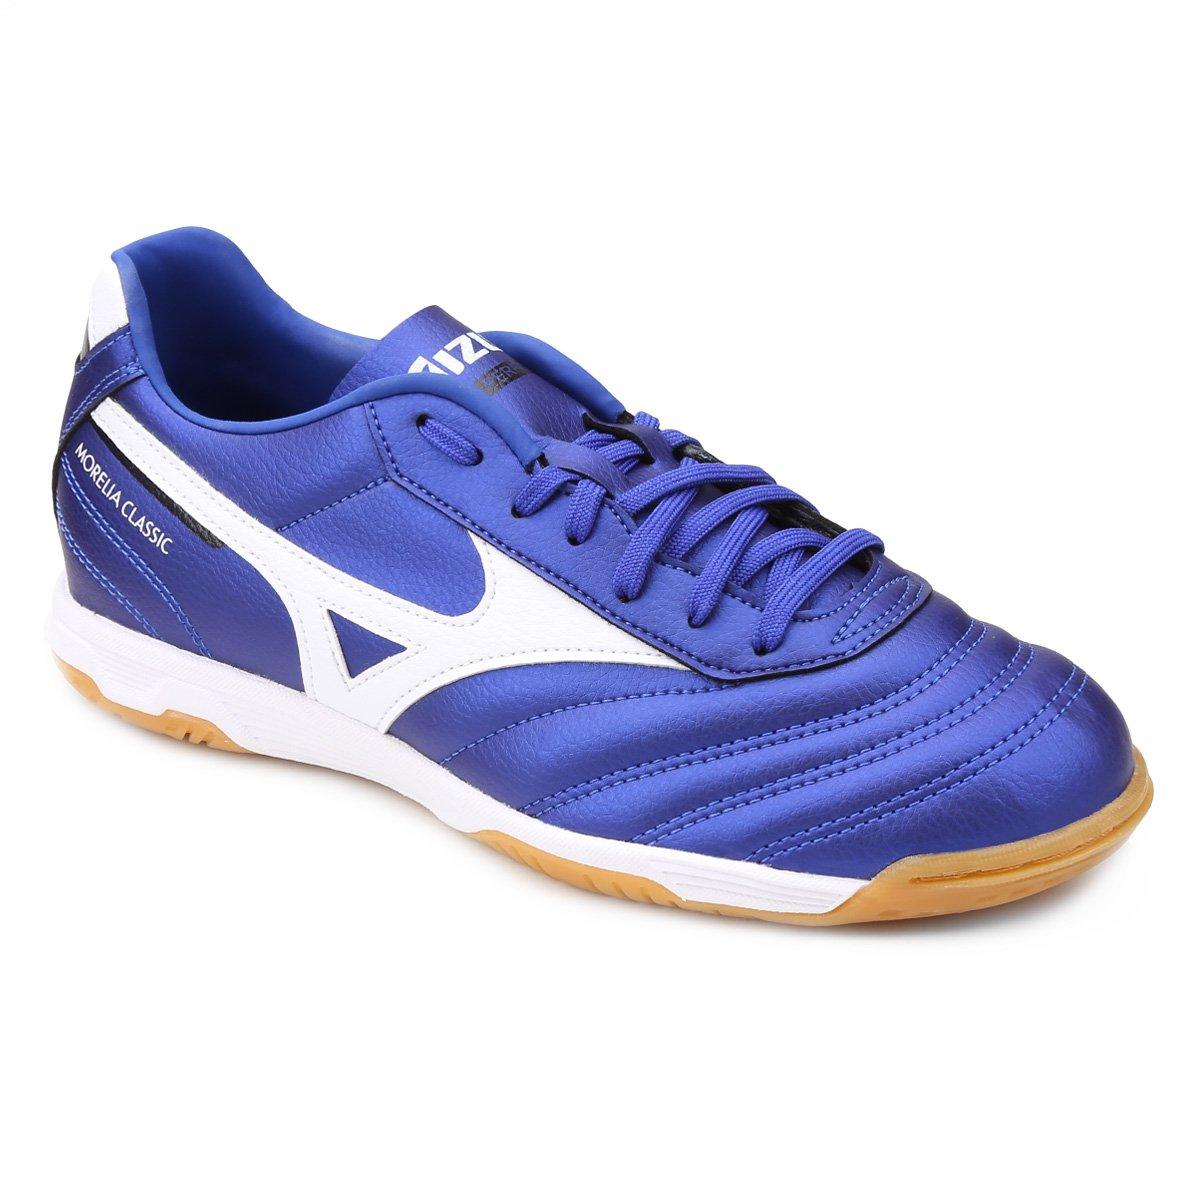 bc332c8ed3279 Chuteira Futsal Mizuno Morelia Classic IN P - Azul e Preto   Netshoes;